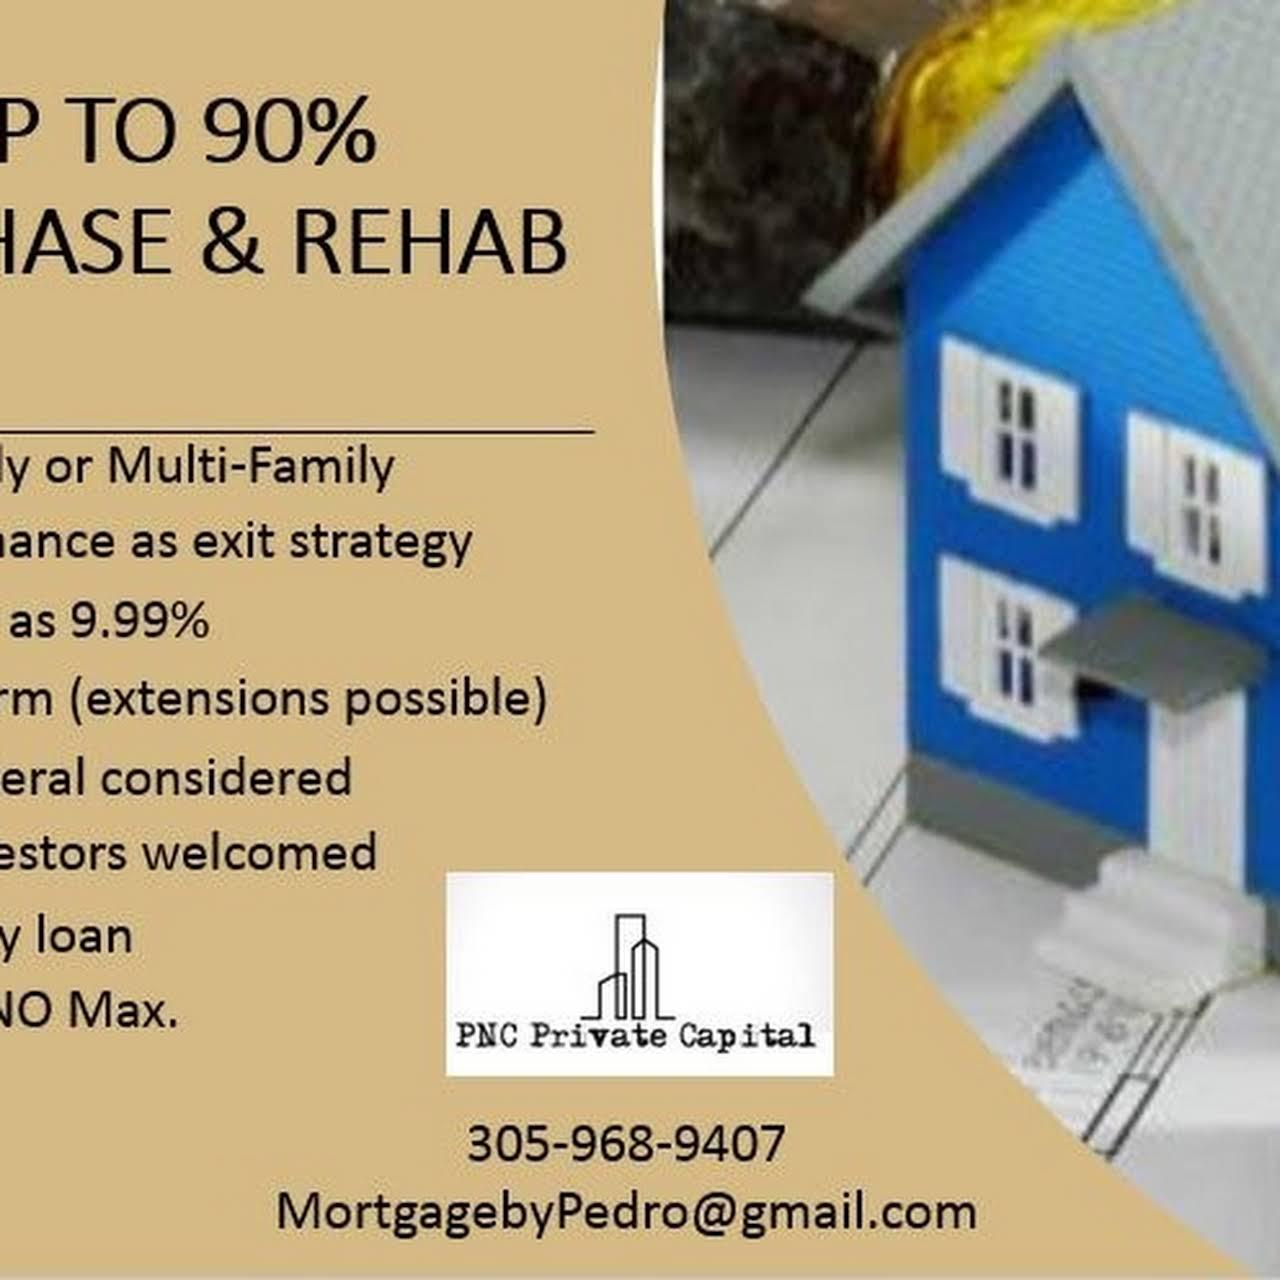 PNC PRIVATE CAPITAL - Private Mortgage Lender in Doral